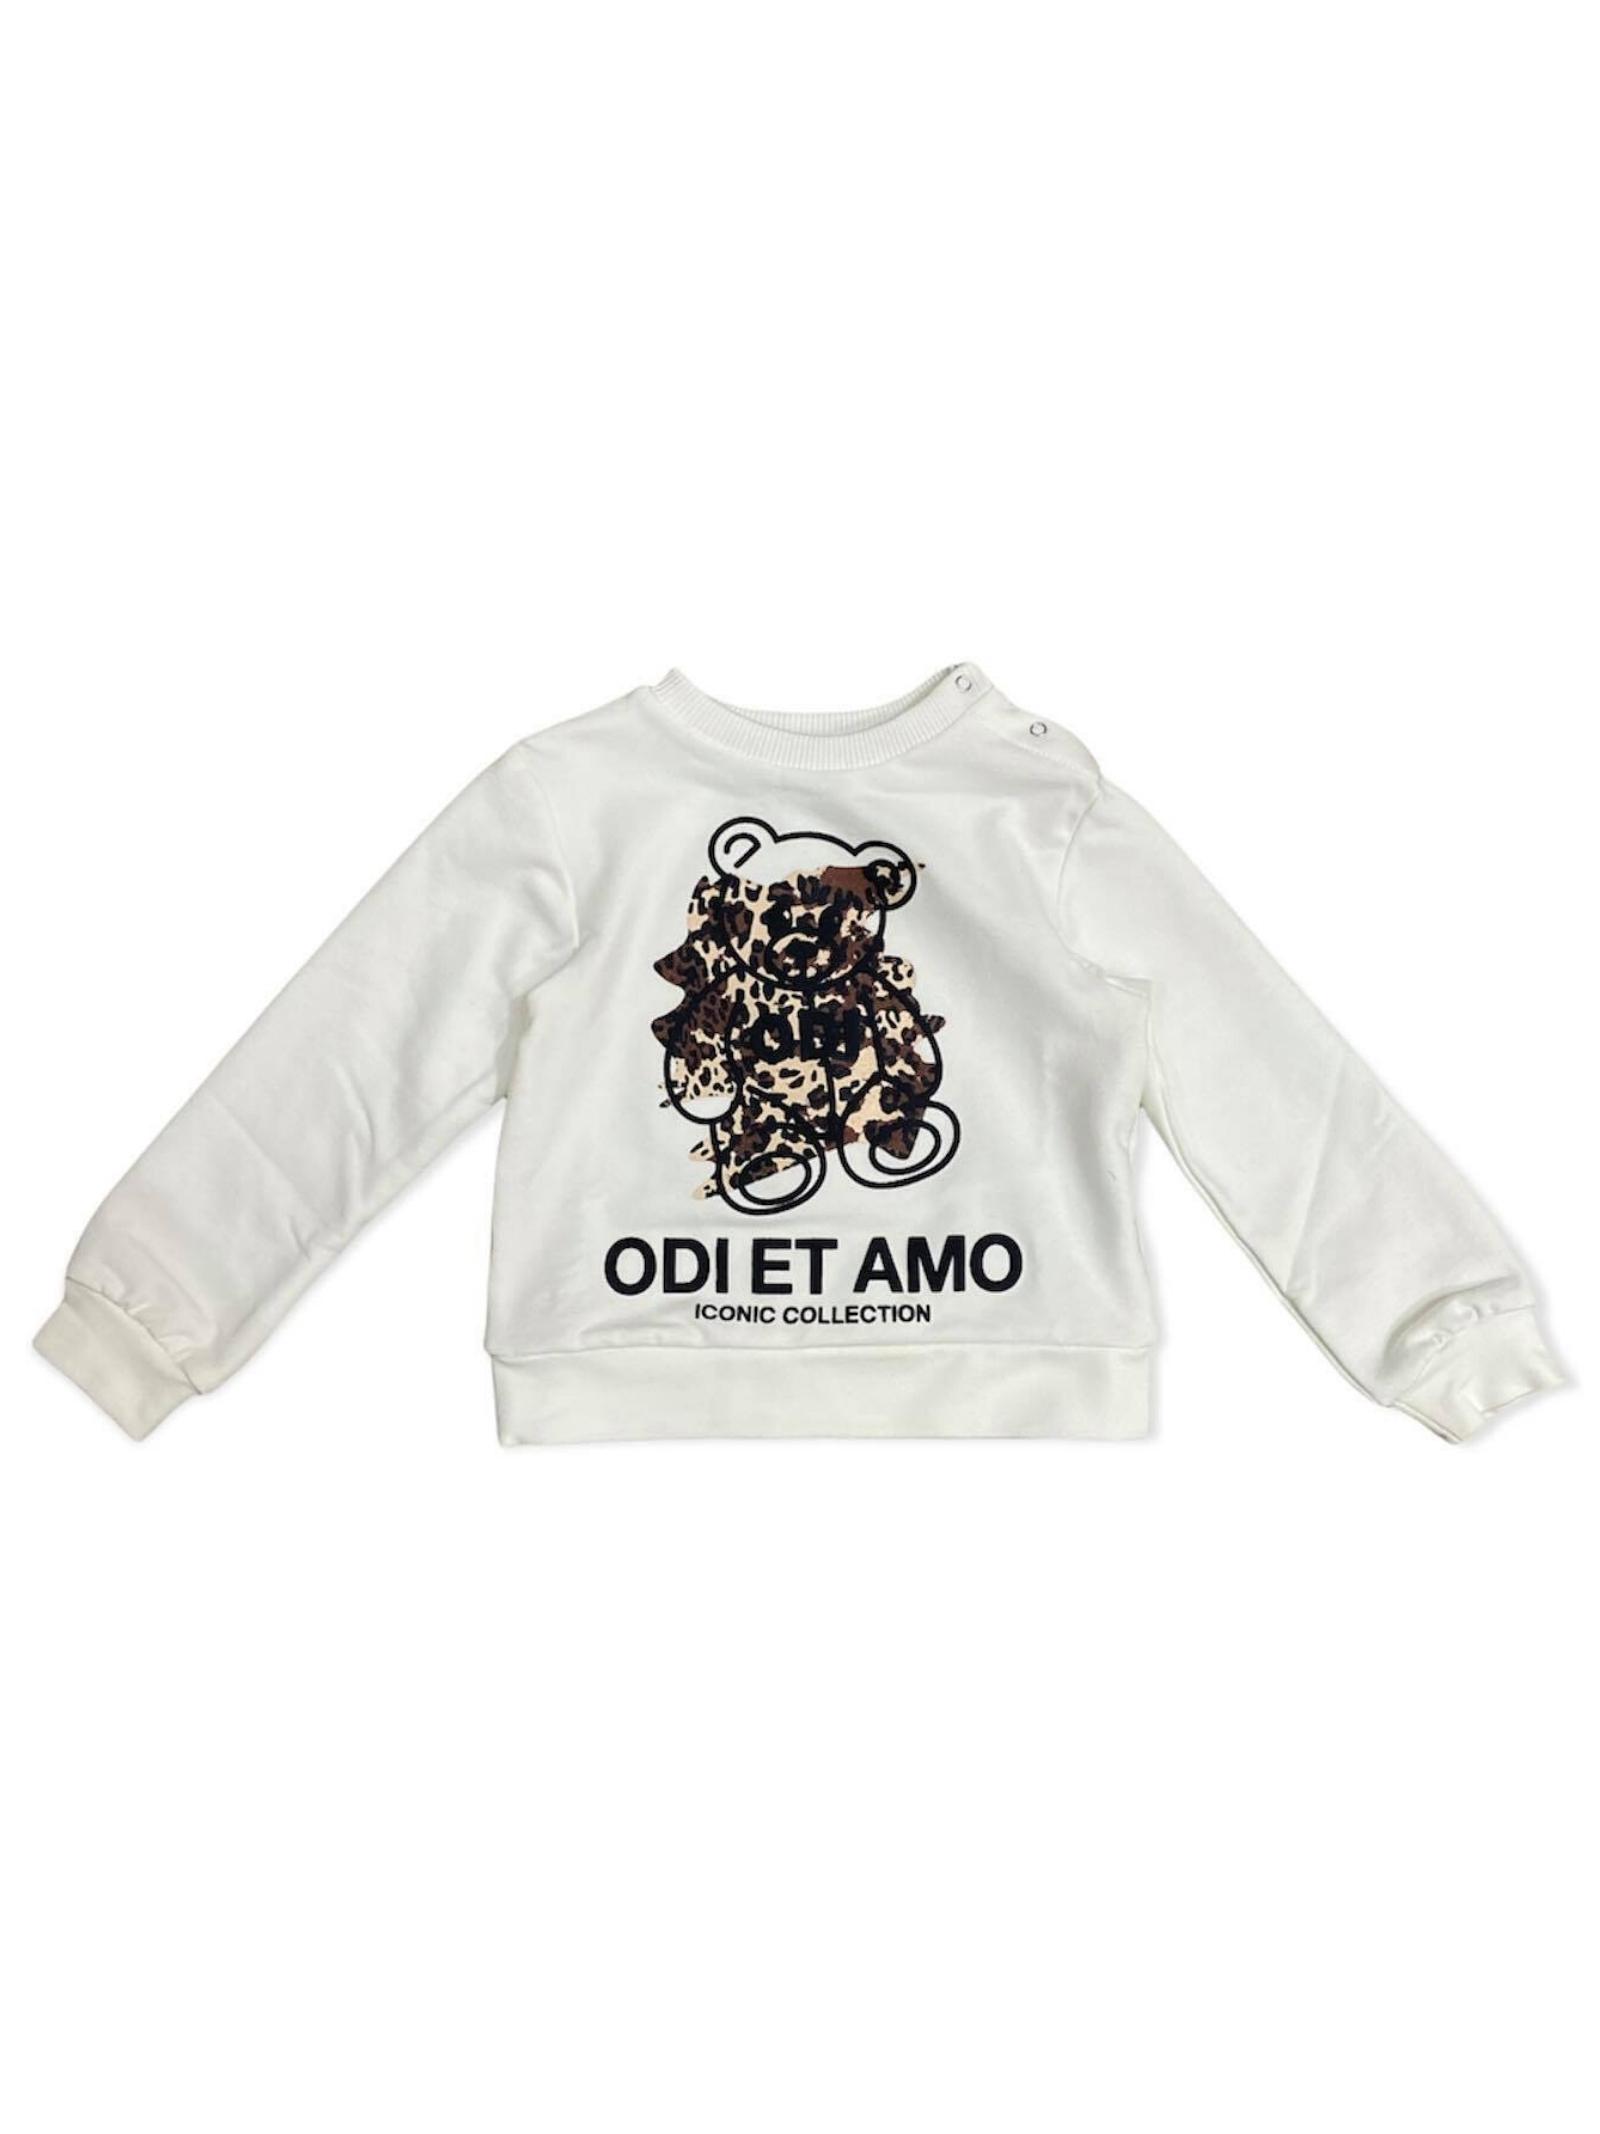 Felpa White Orsetto Bambina ODI ET AMO KIDS | Felpe | ODNST9880WHM